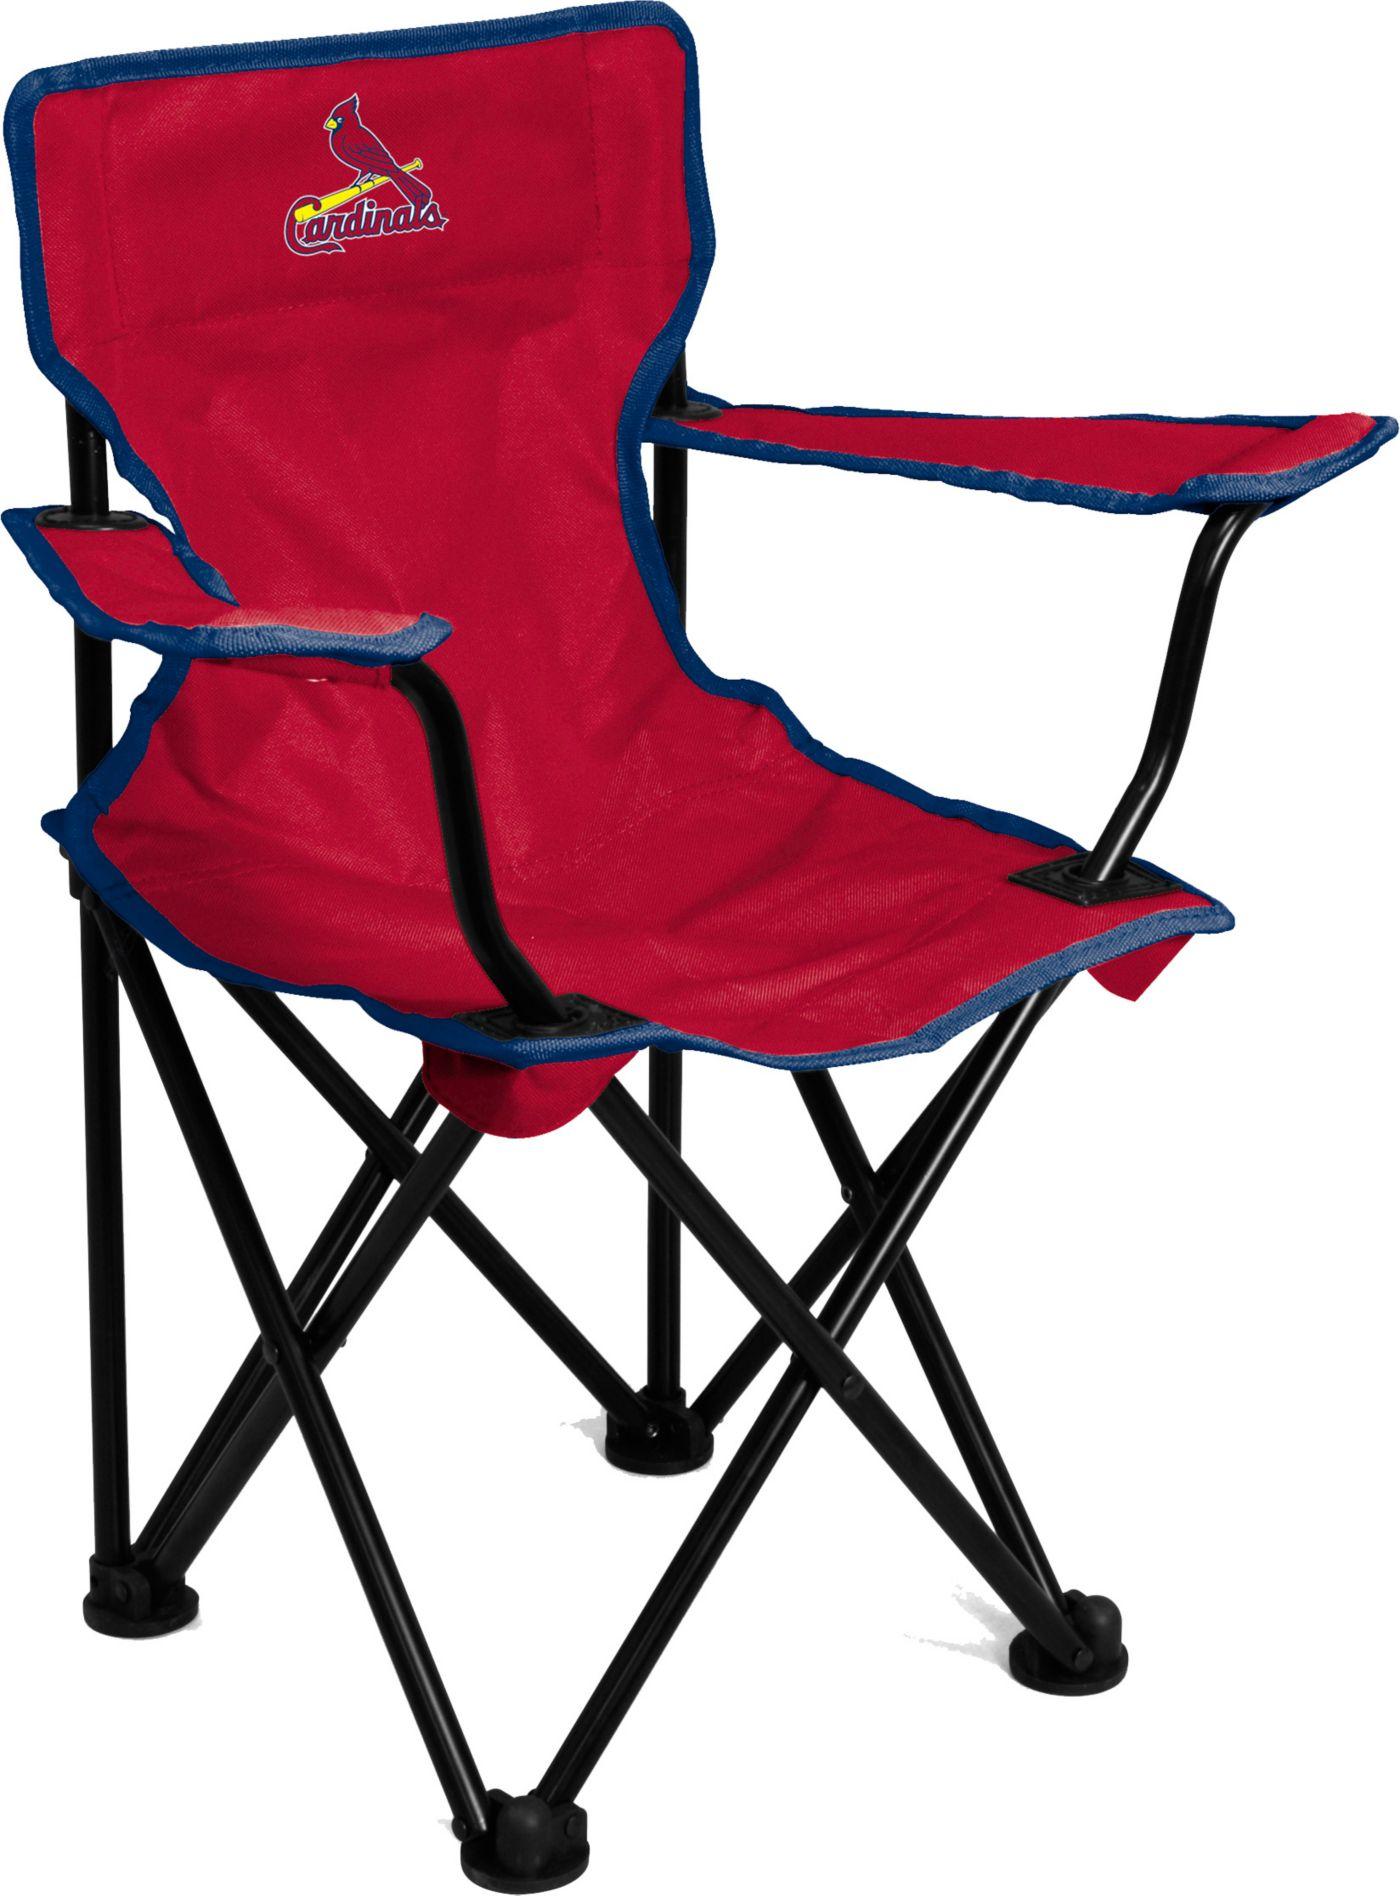 St. Louis Cardinals Toddler Chair